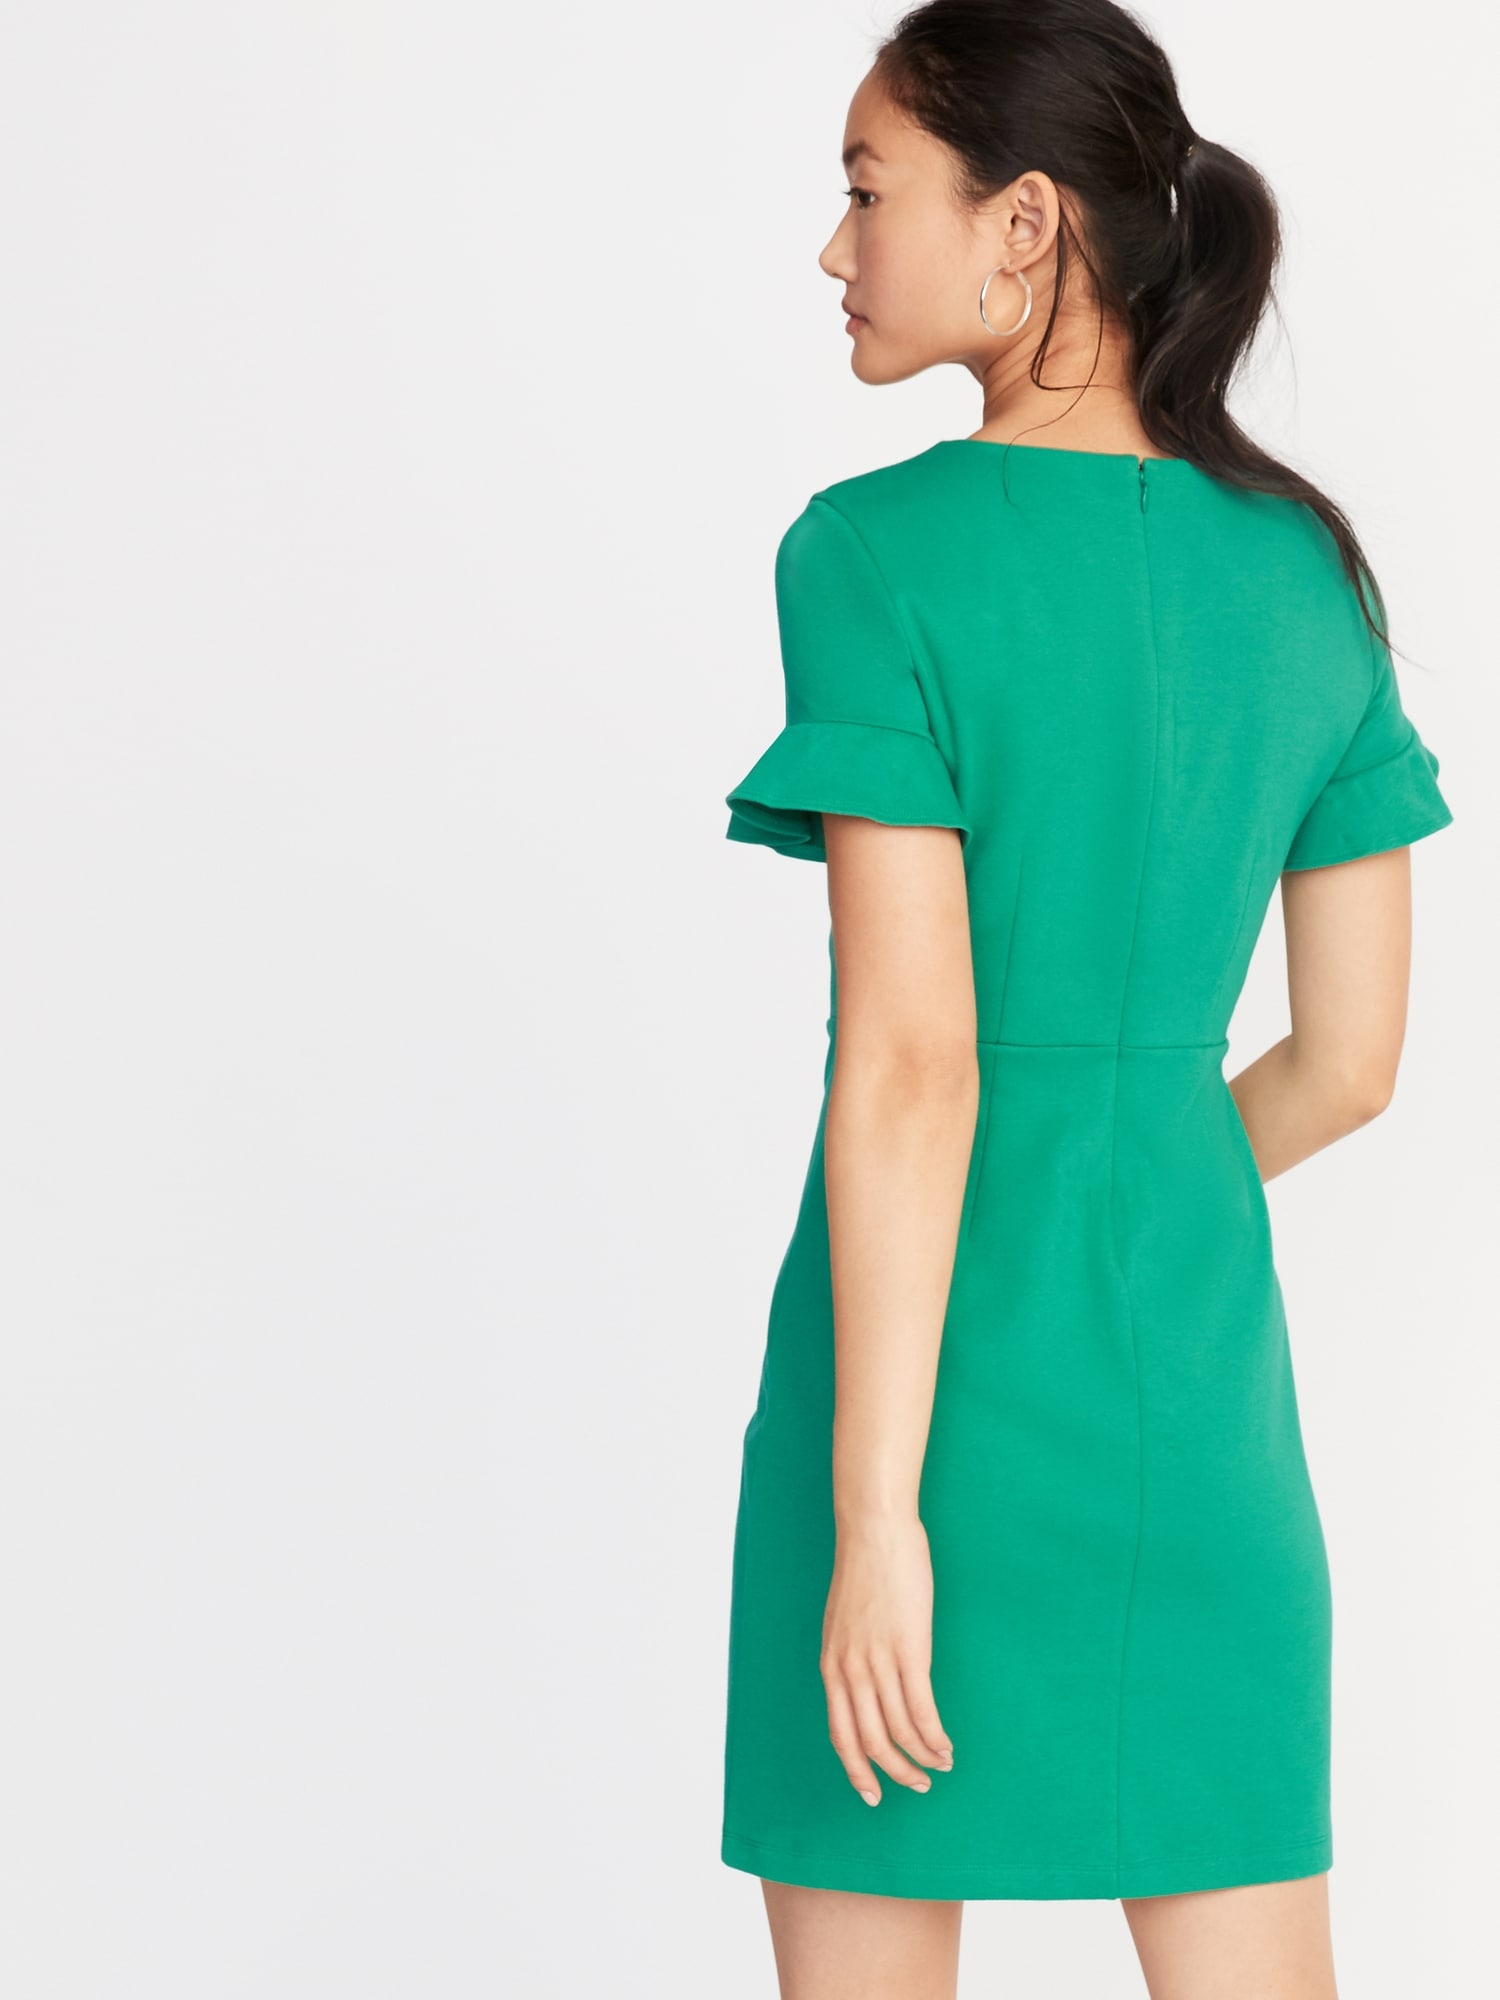 6cdb88d09ac46 Ponte-Knit Flutter-Sleeve Sheath Dress for Women